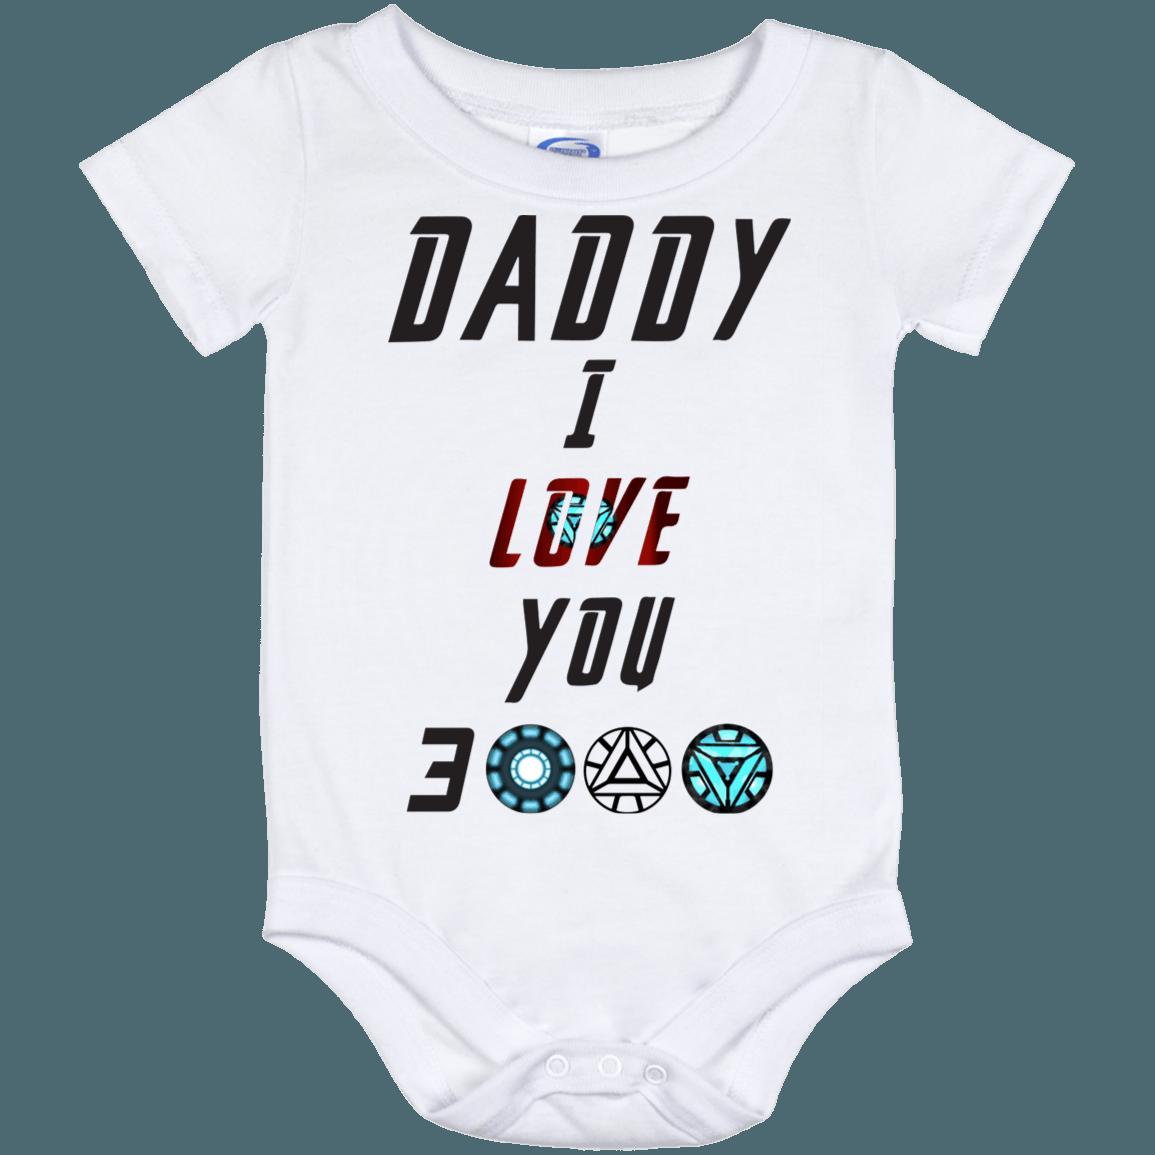 7007d37b Daddy I Love You 3000 Baby Onesie Shirt - Dad I Love You Three Thousand Baby  - CubeBik ™